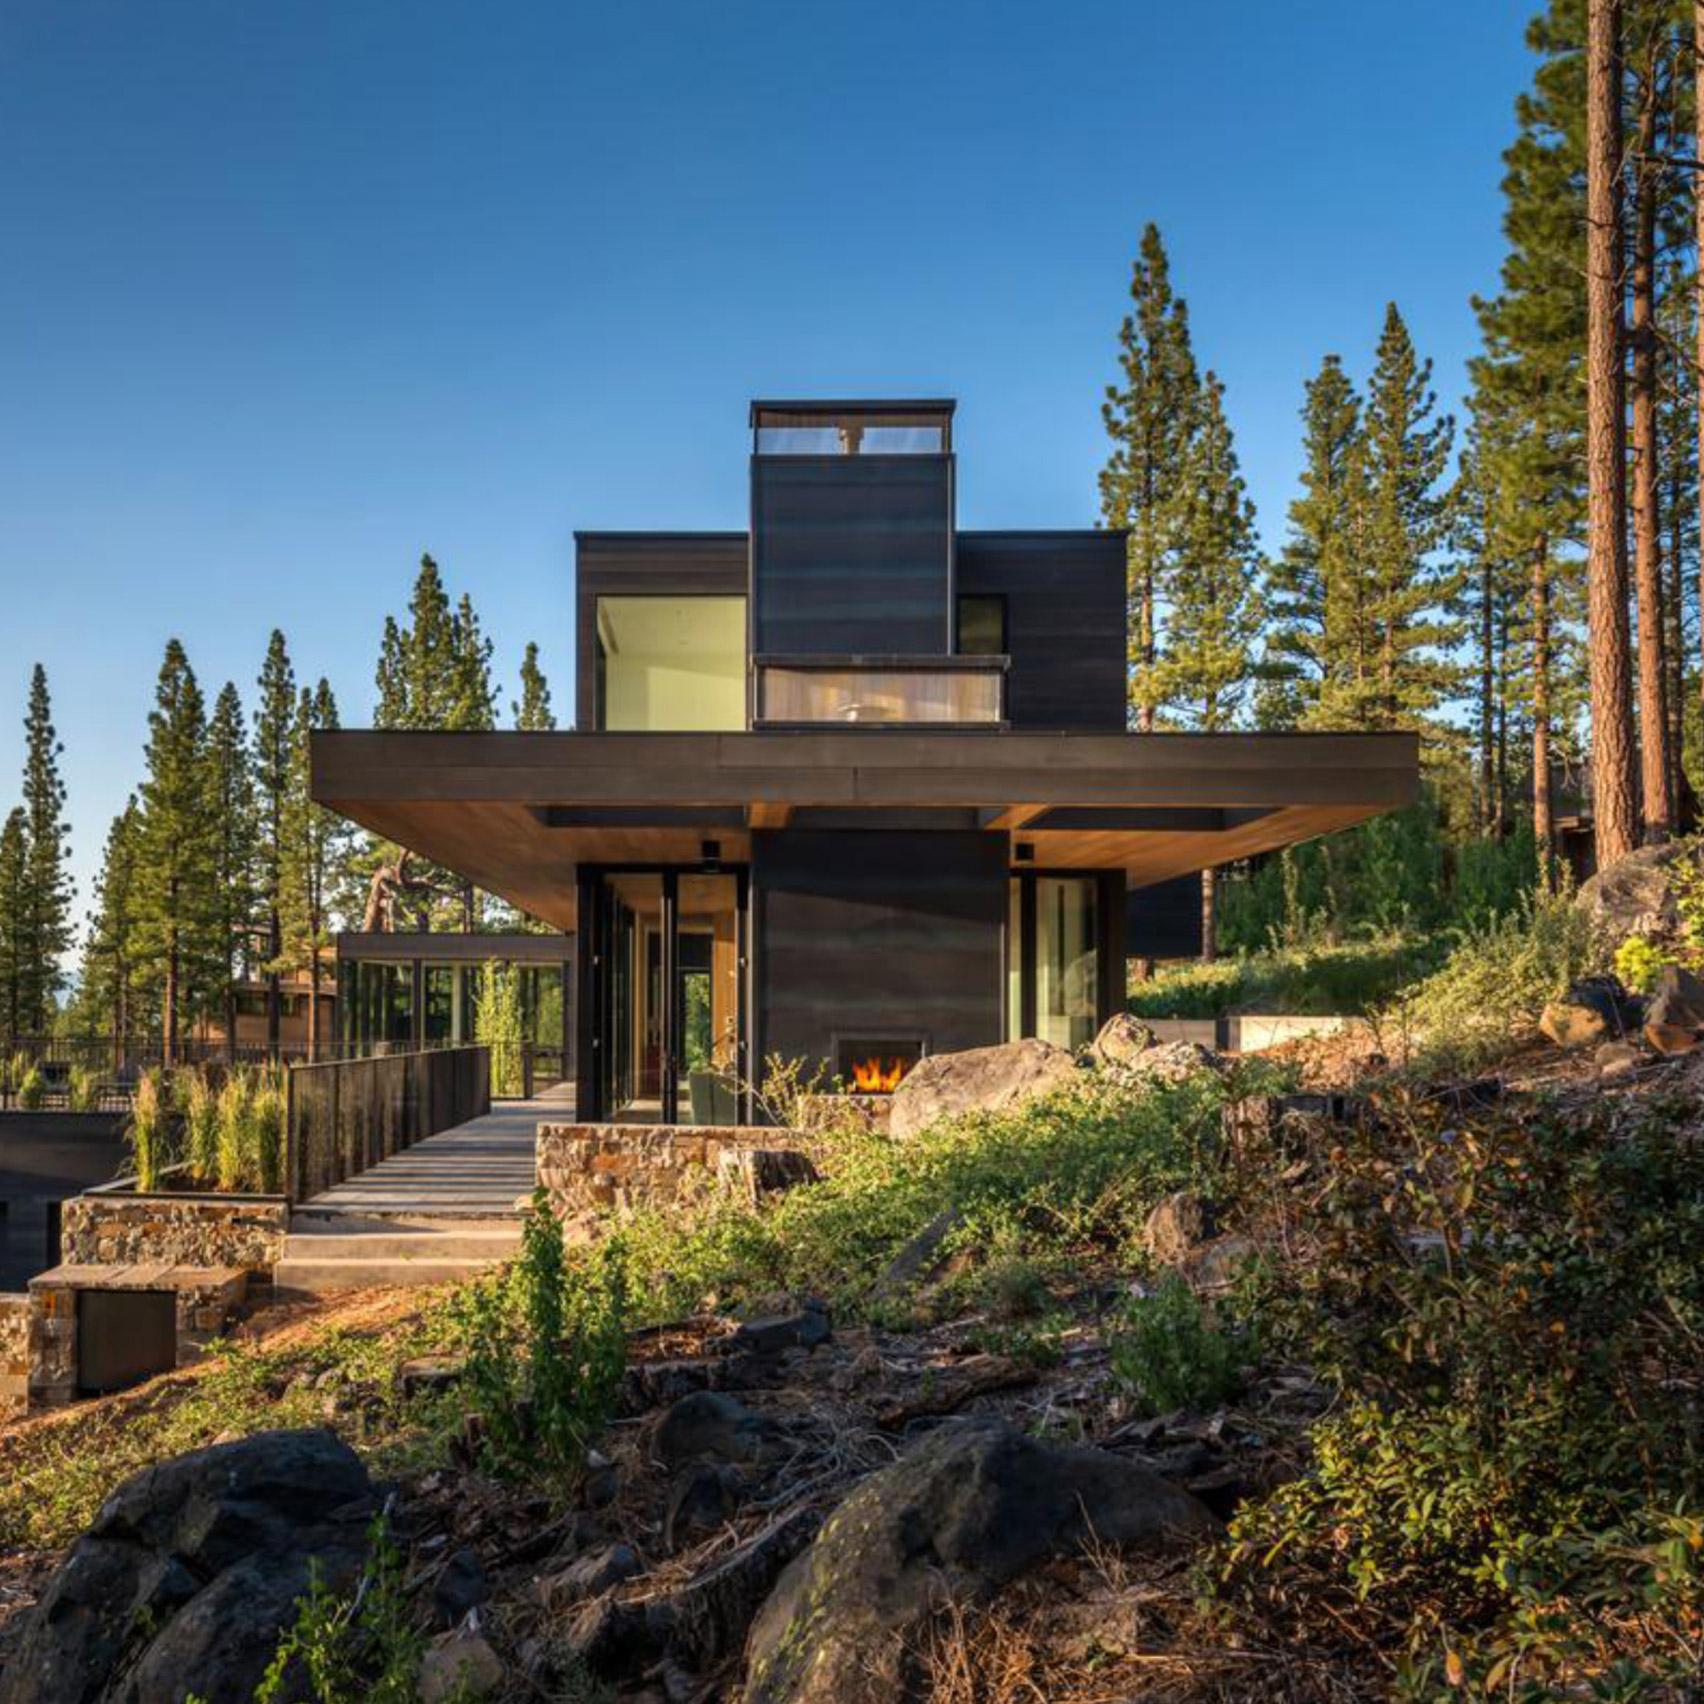 3novices studio bergtraun perches black cabin on steep for Sierra nevada cabine